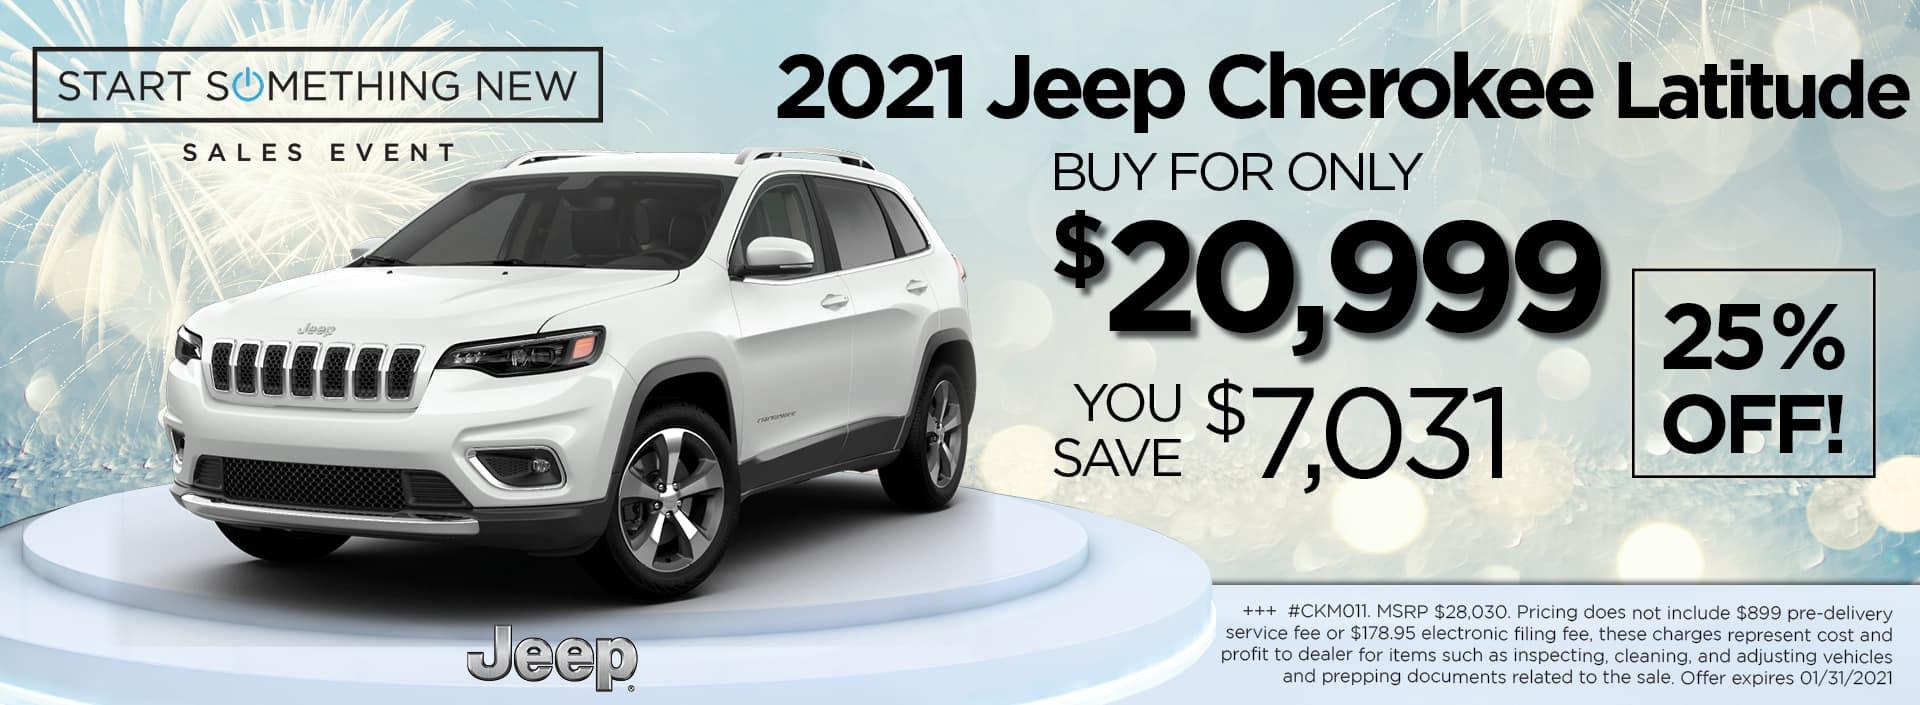 2021 Cherokee 20999